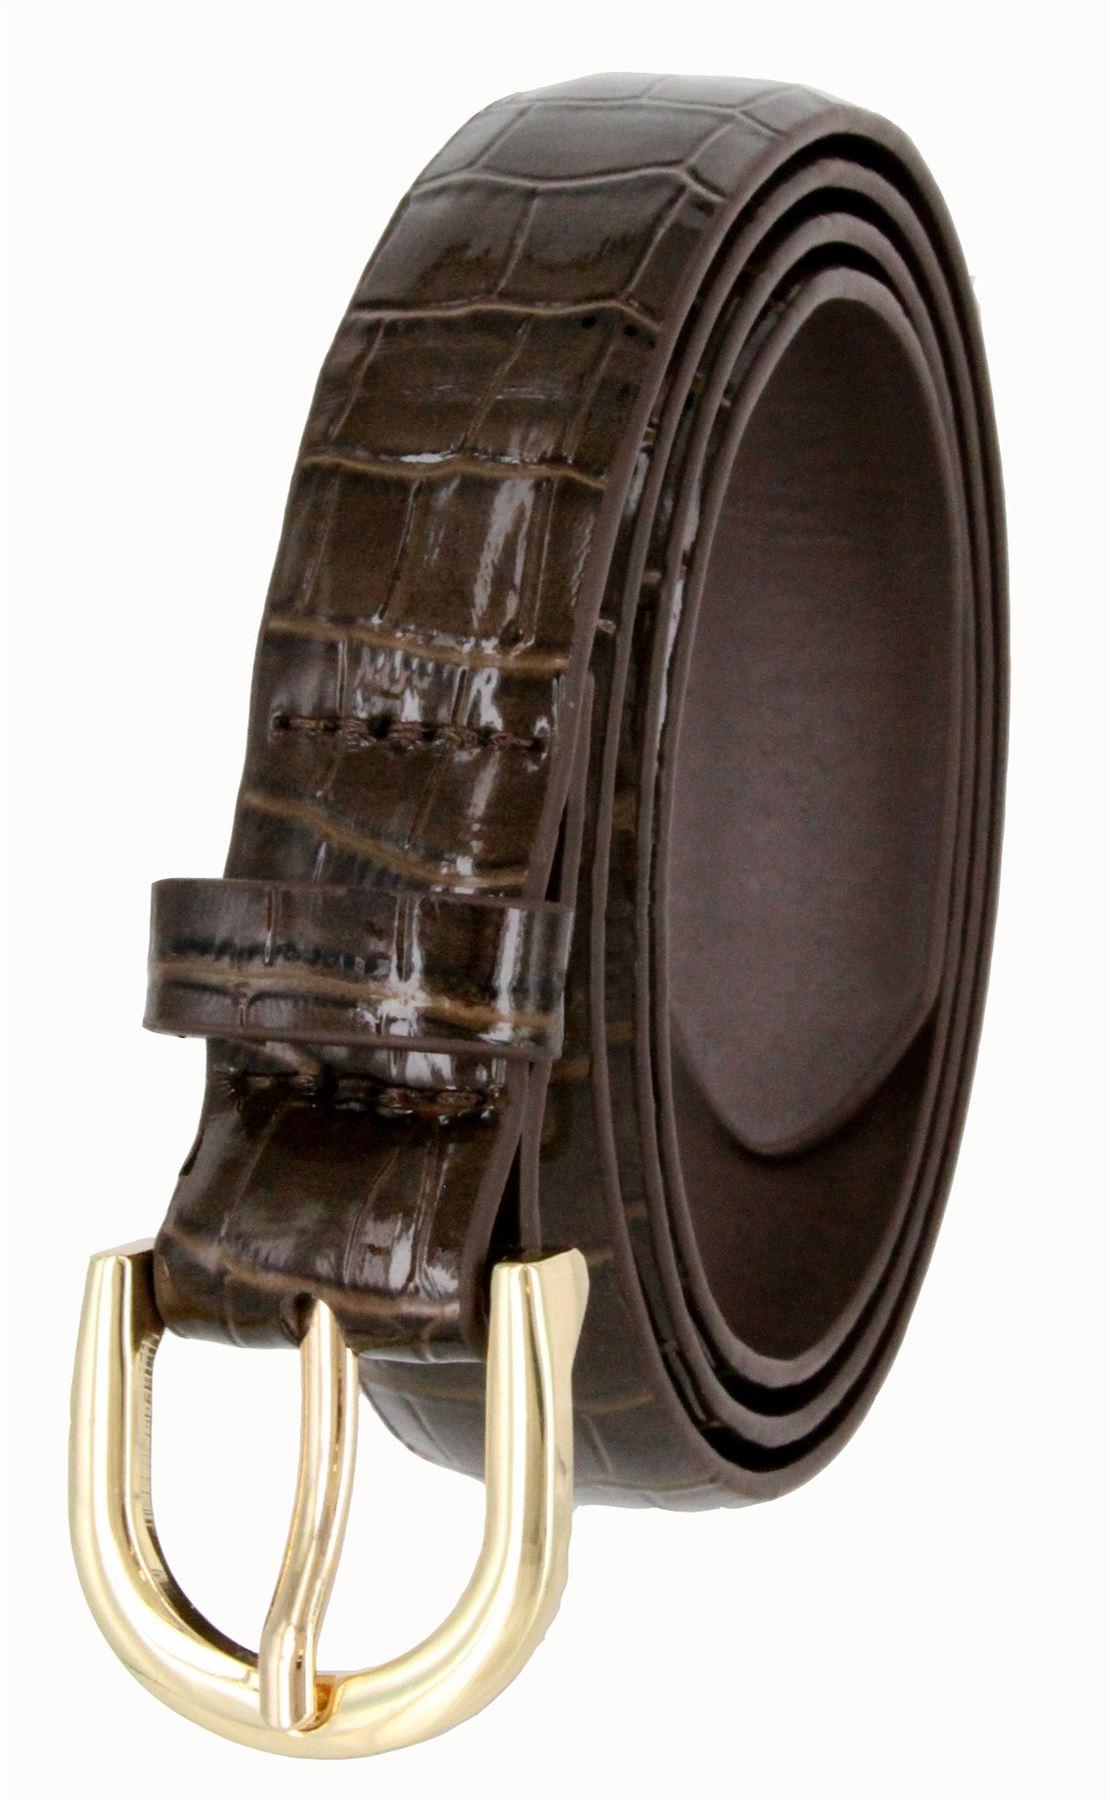 Women-039-s-Skinny-Thin-Alligator-Embossed-Genuine-Leather-Belt-1-034-25mm-Wide thumbnail 10